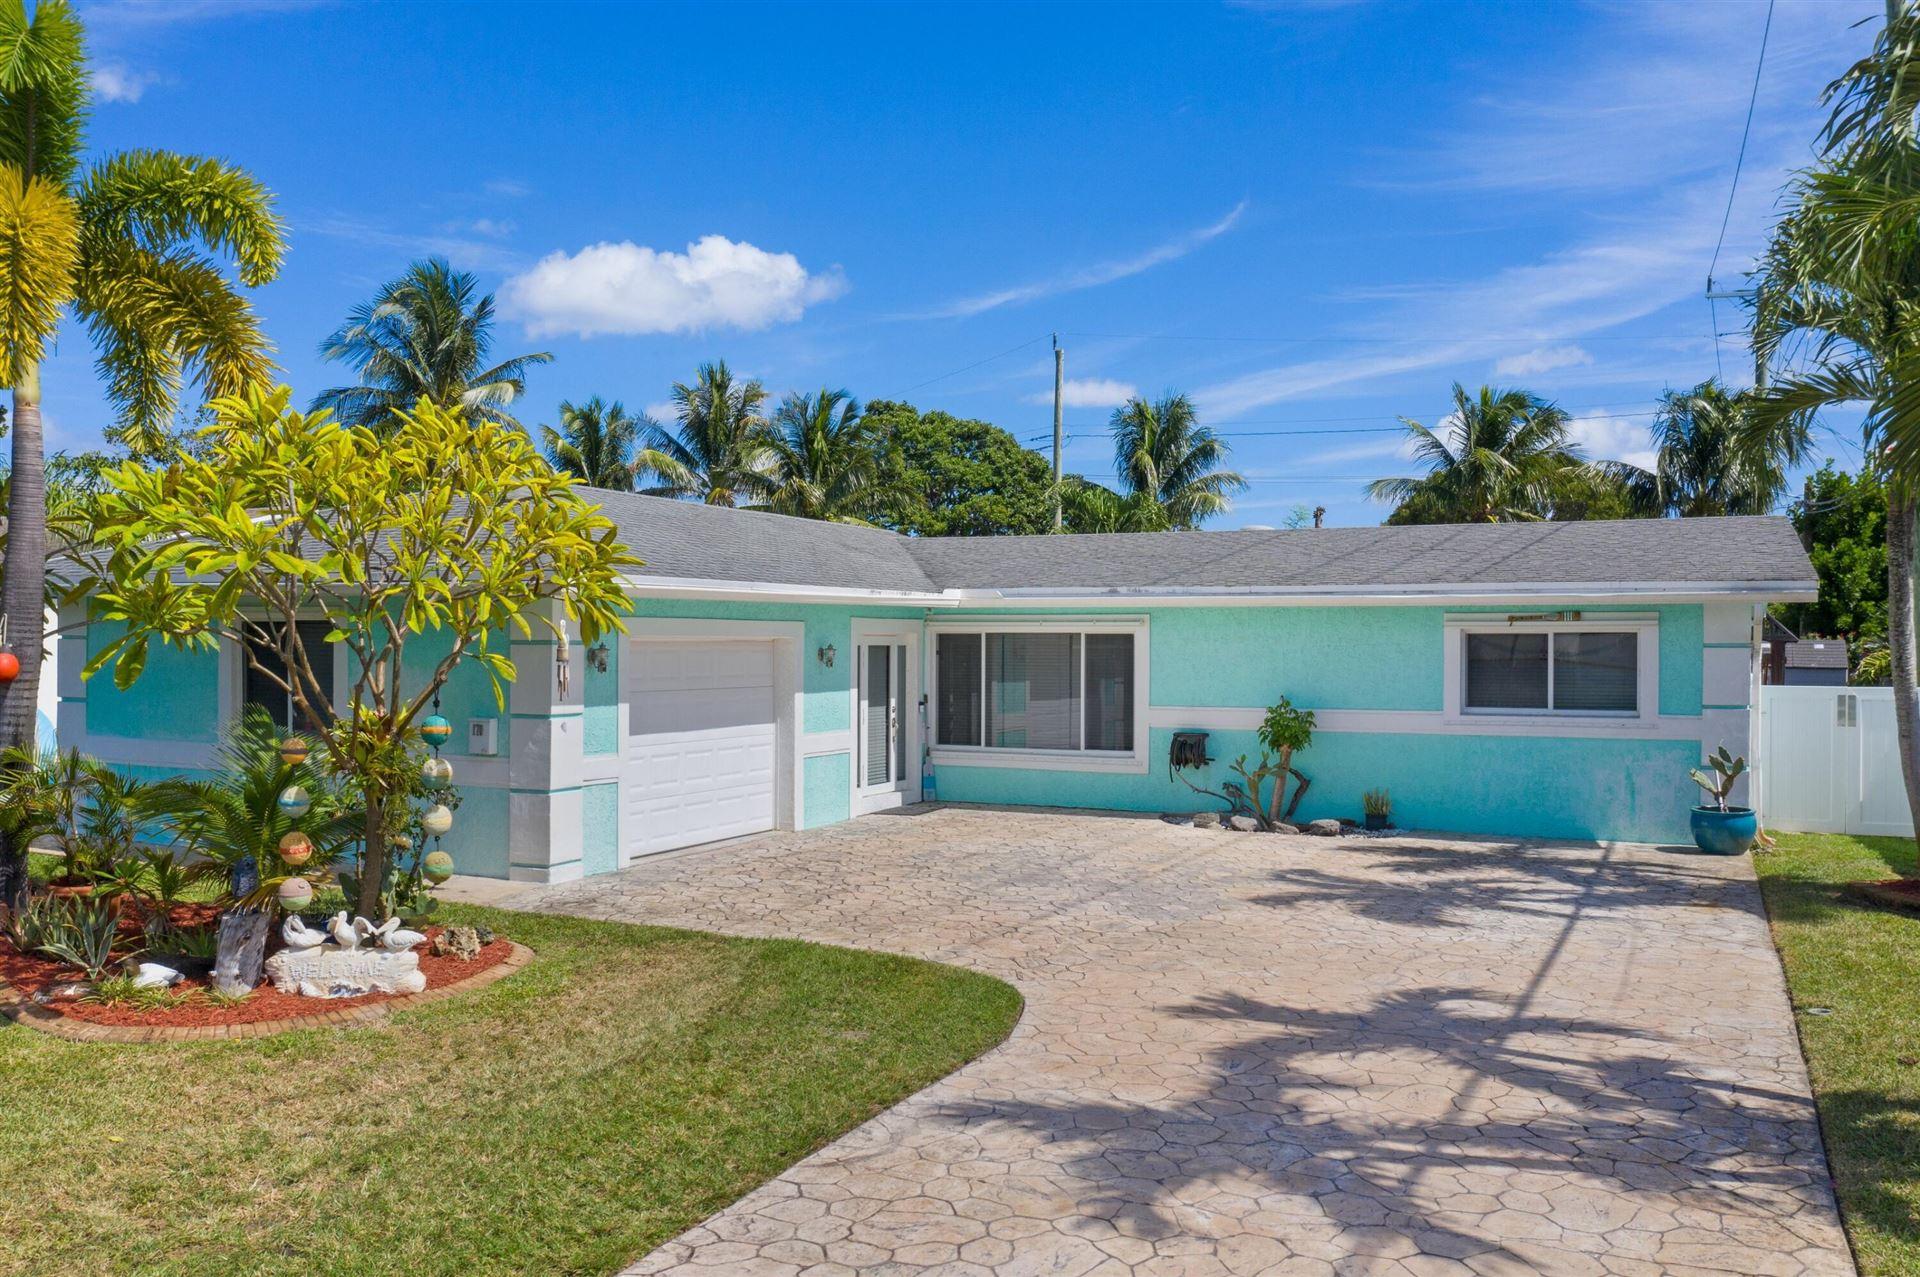 170 SE 5th Ave, Deerfield Beach, FL 33441 - MLS#: RX-10753817